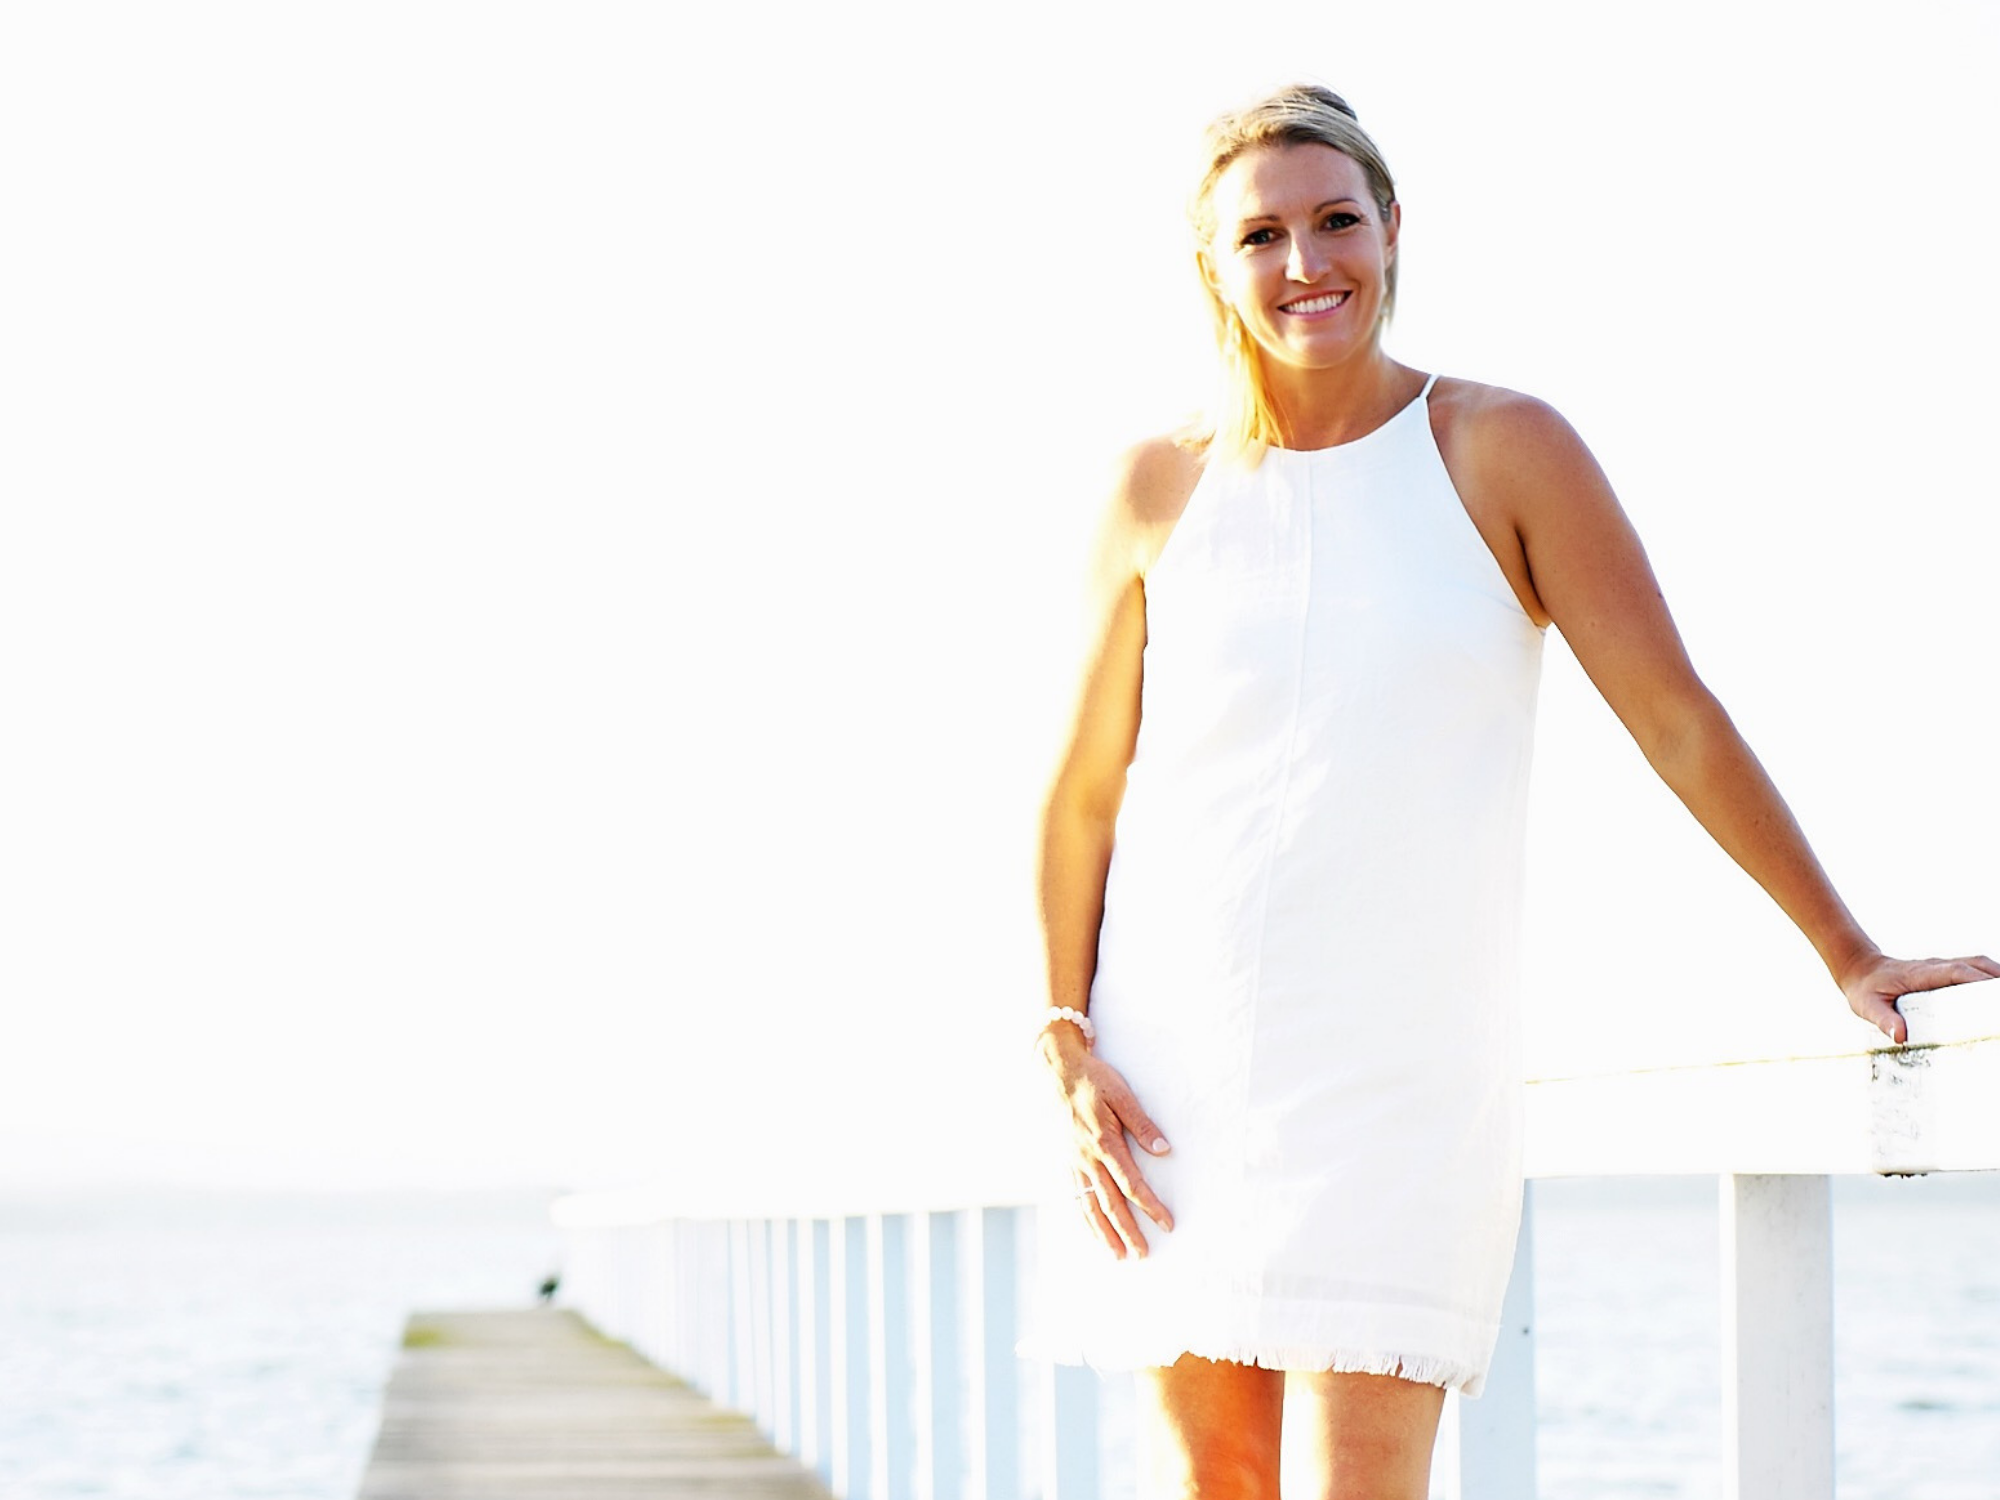 kate-boyden-divorce-lawyer-Separation-life-coach-australia-17.jpg